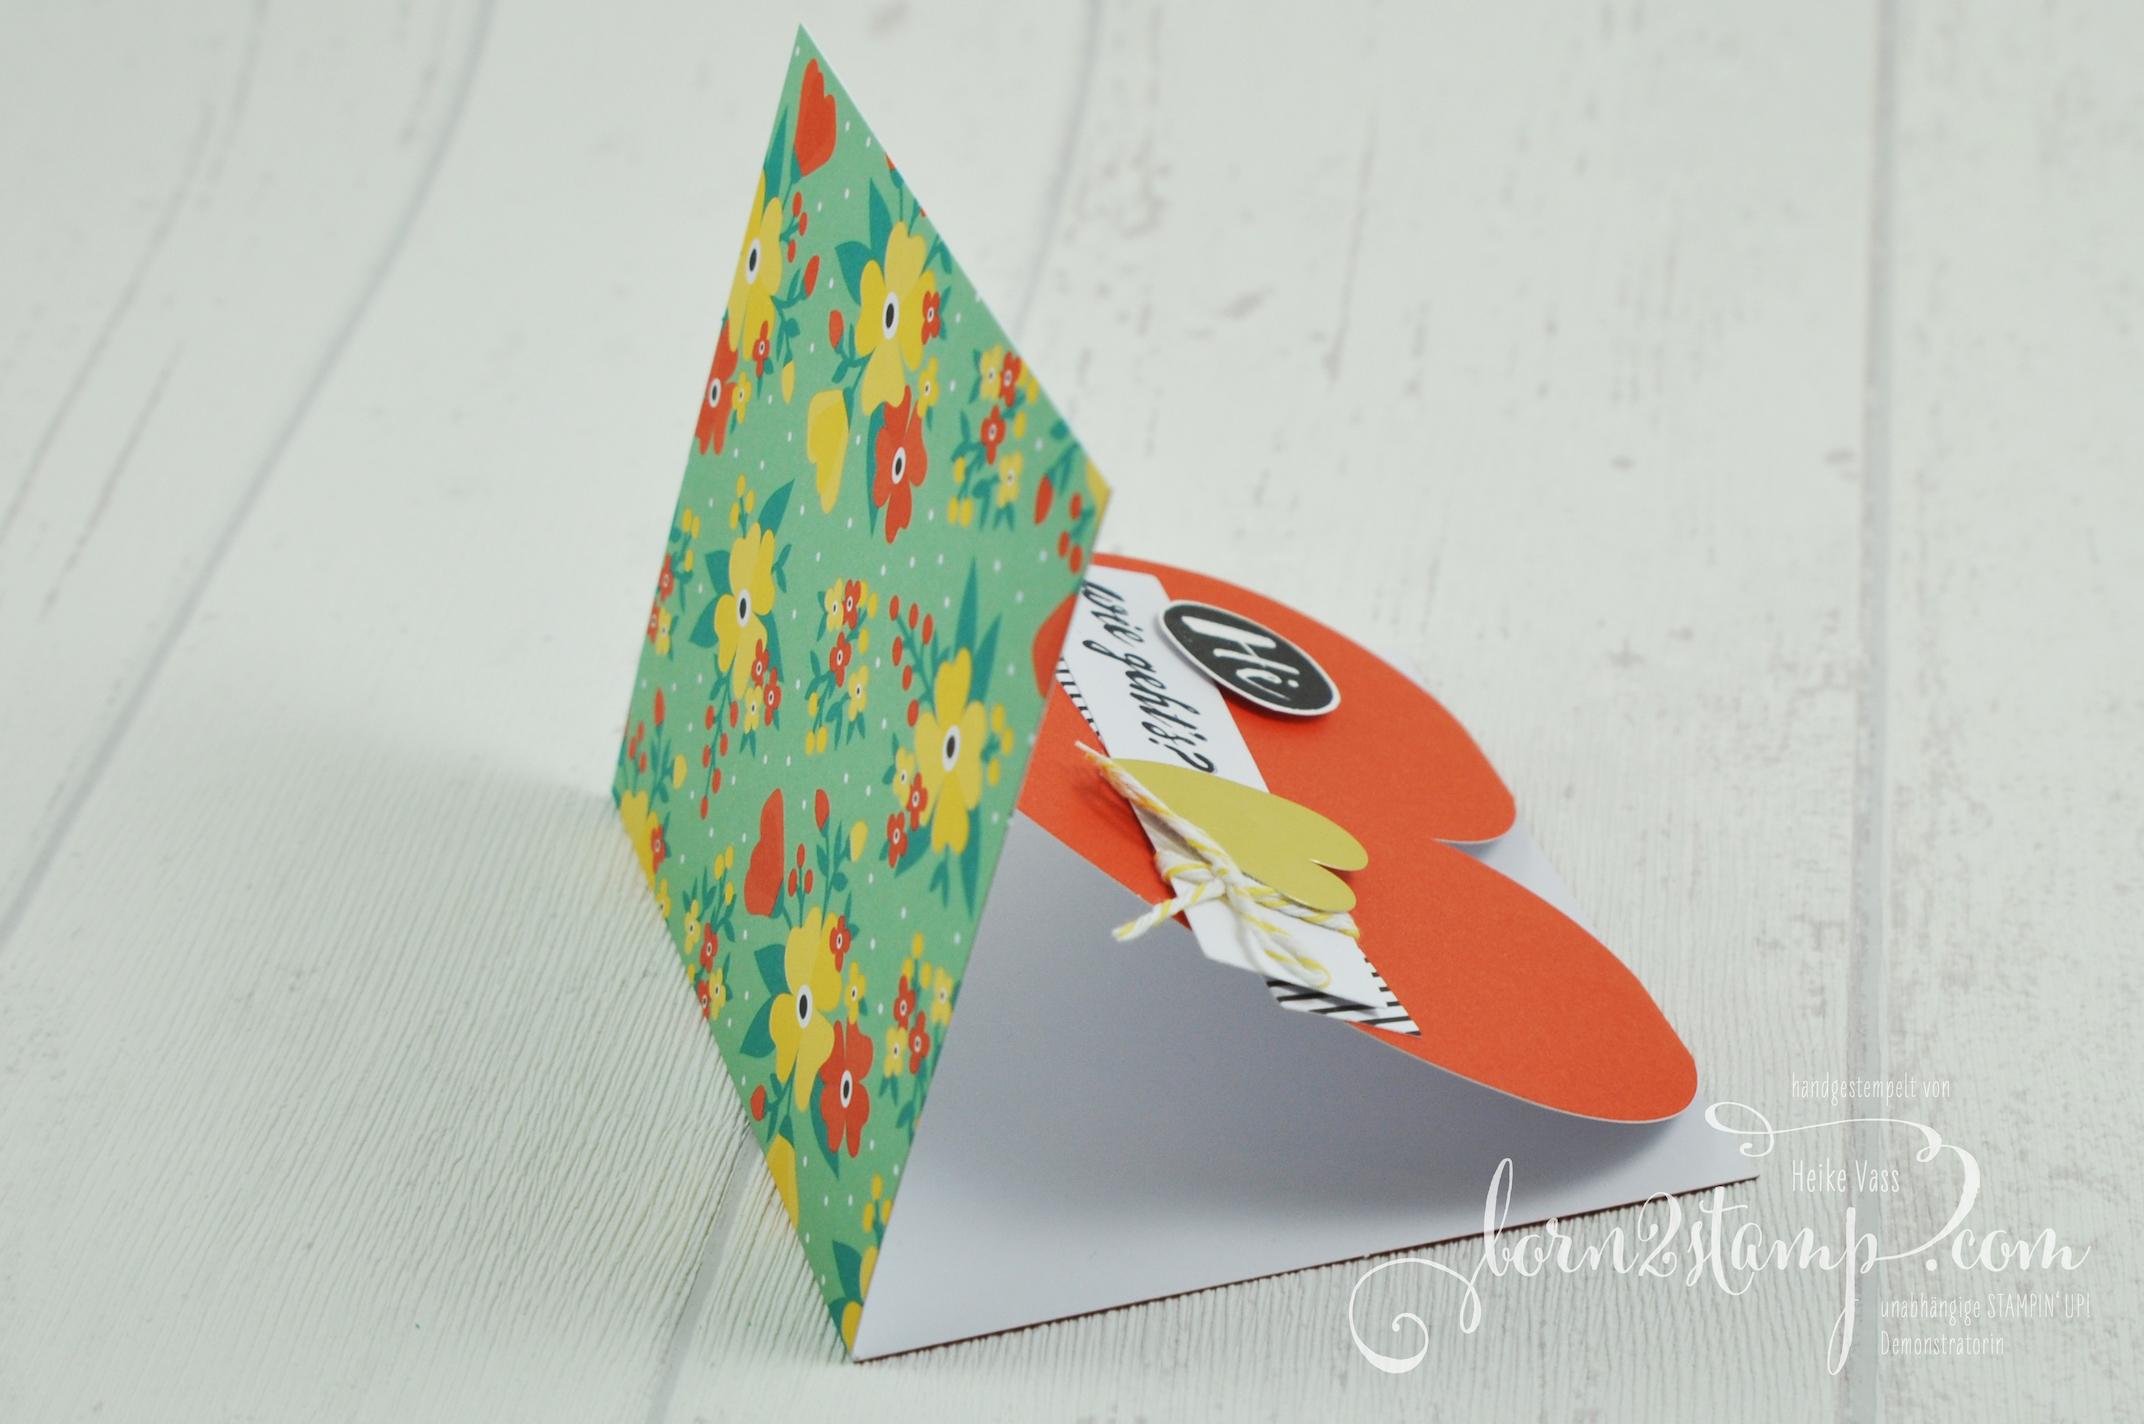 born2stamp STAMPIN' UP! Grusskarte – Kartenset Gute-Laune-Gruesse